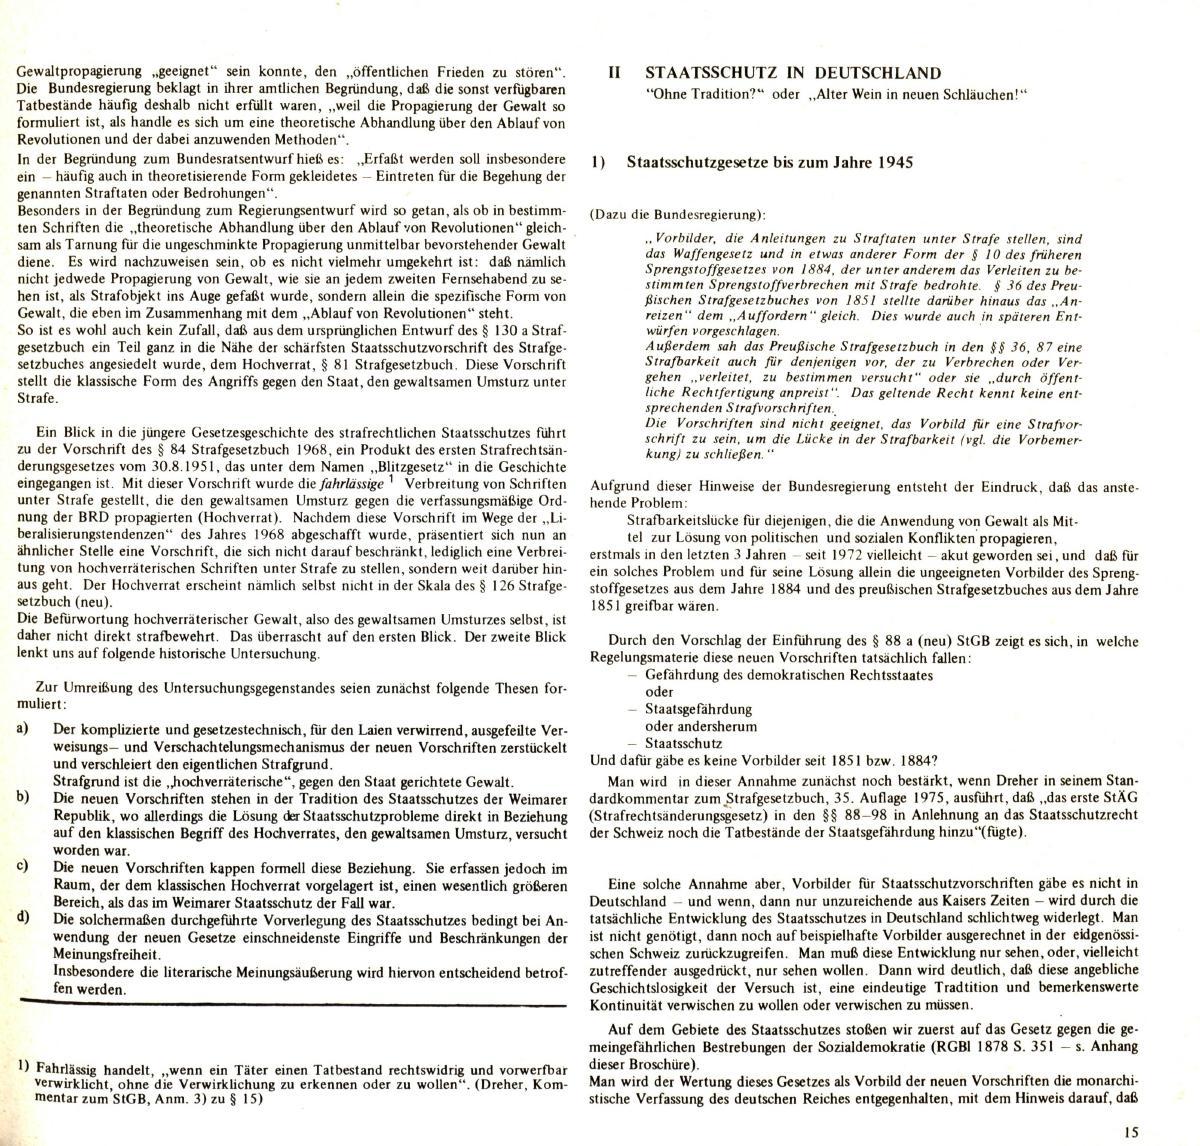 REP_VLB_1976_Die_Zensurgesetze_16